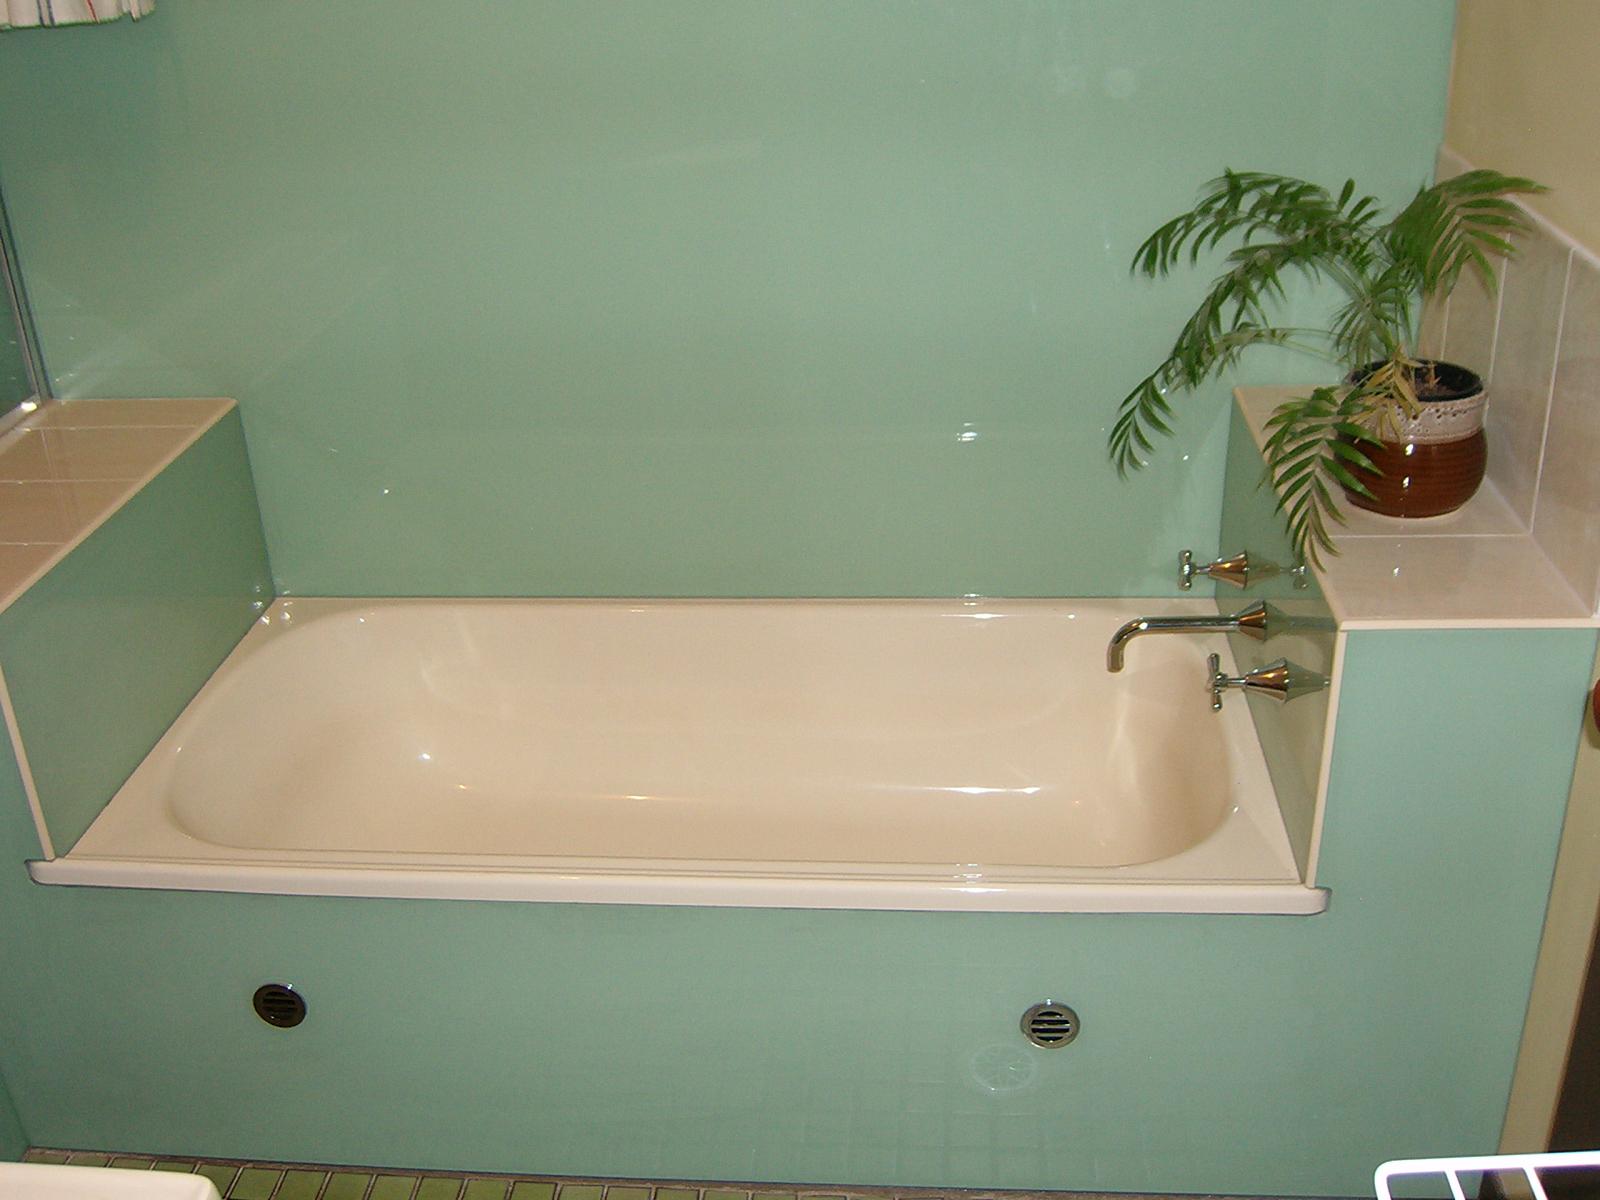 Beautiful Acrylic Splashbacks For Showers And Bathrooms Ozzie Splash